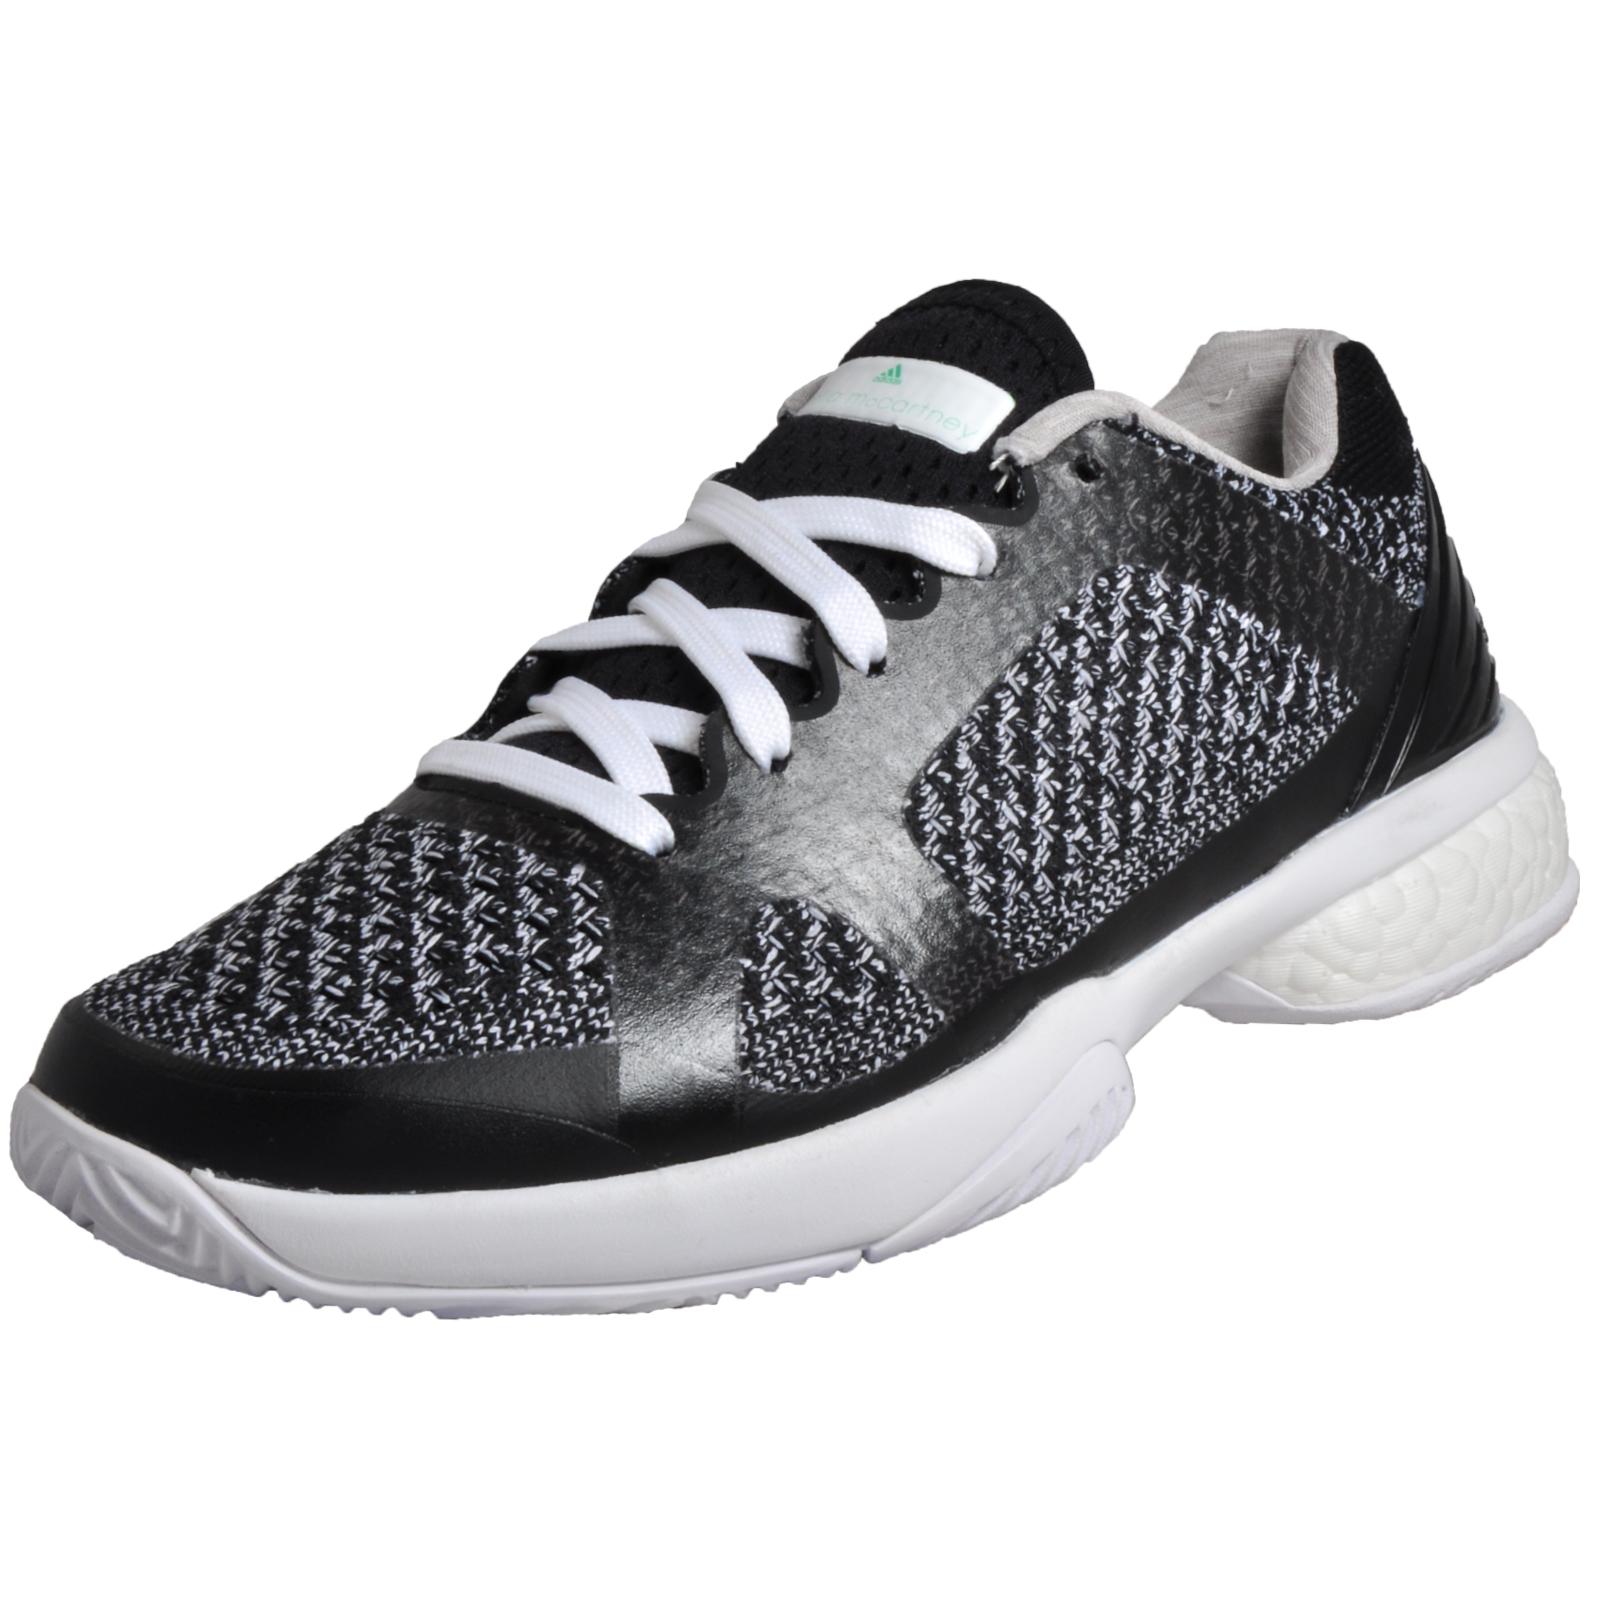 eee0fb310b Adidas ASMC Stella McCartney Barricade Boost Women's Tennis Shoes Black